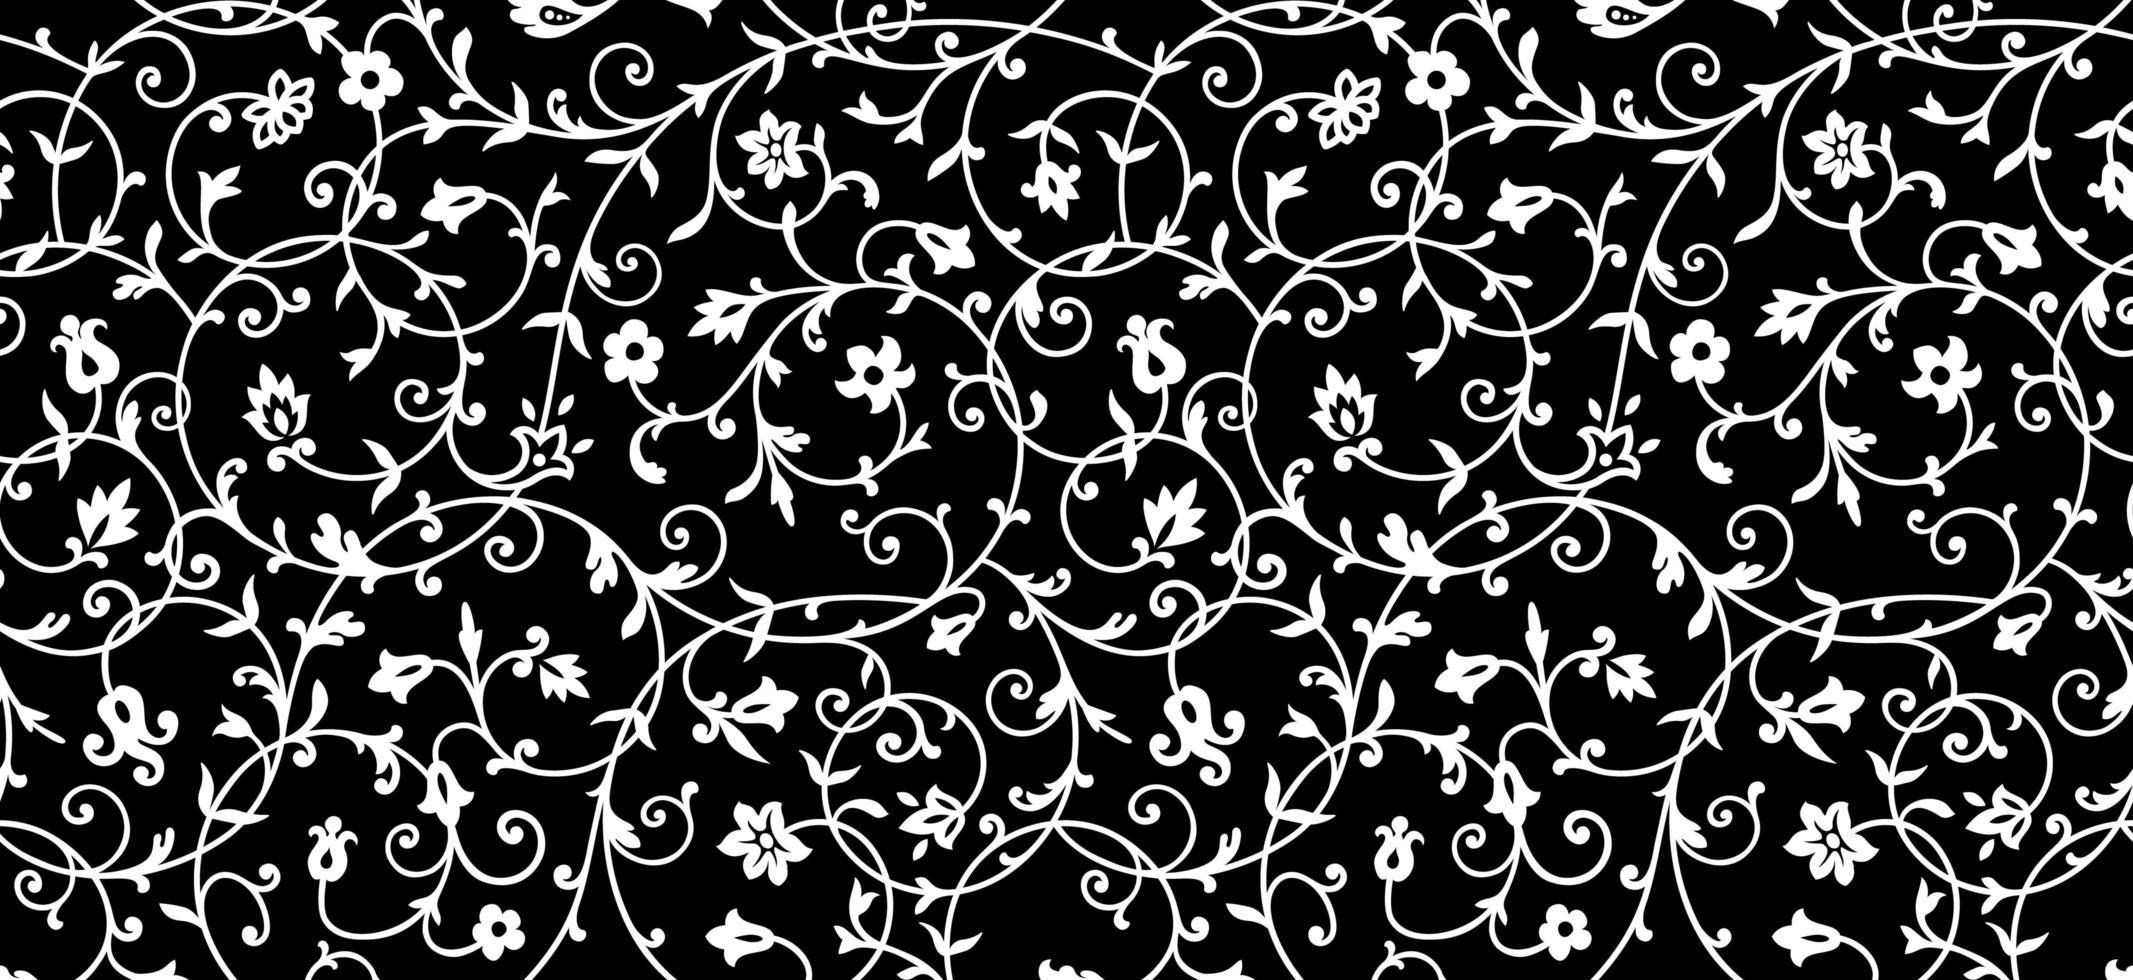 teste padrão floral vintage em branco no preto vetor